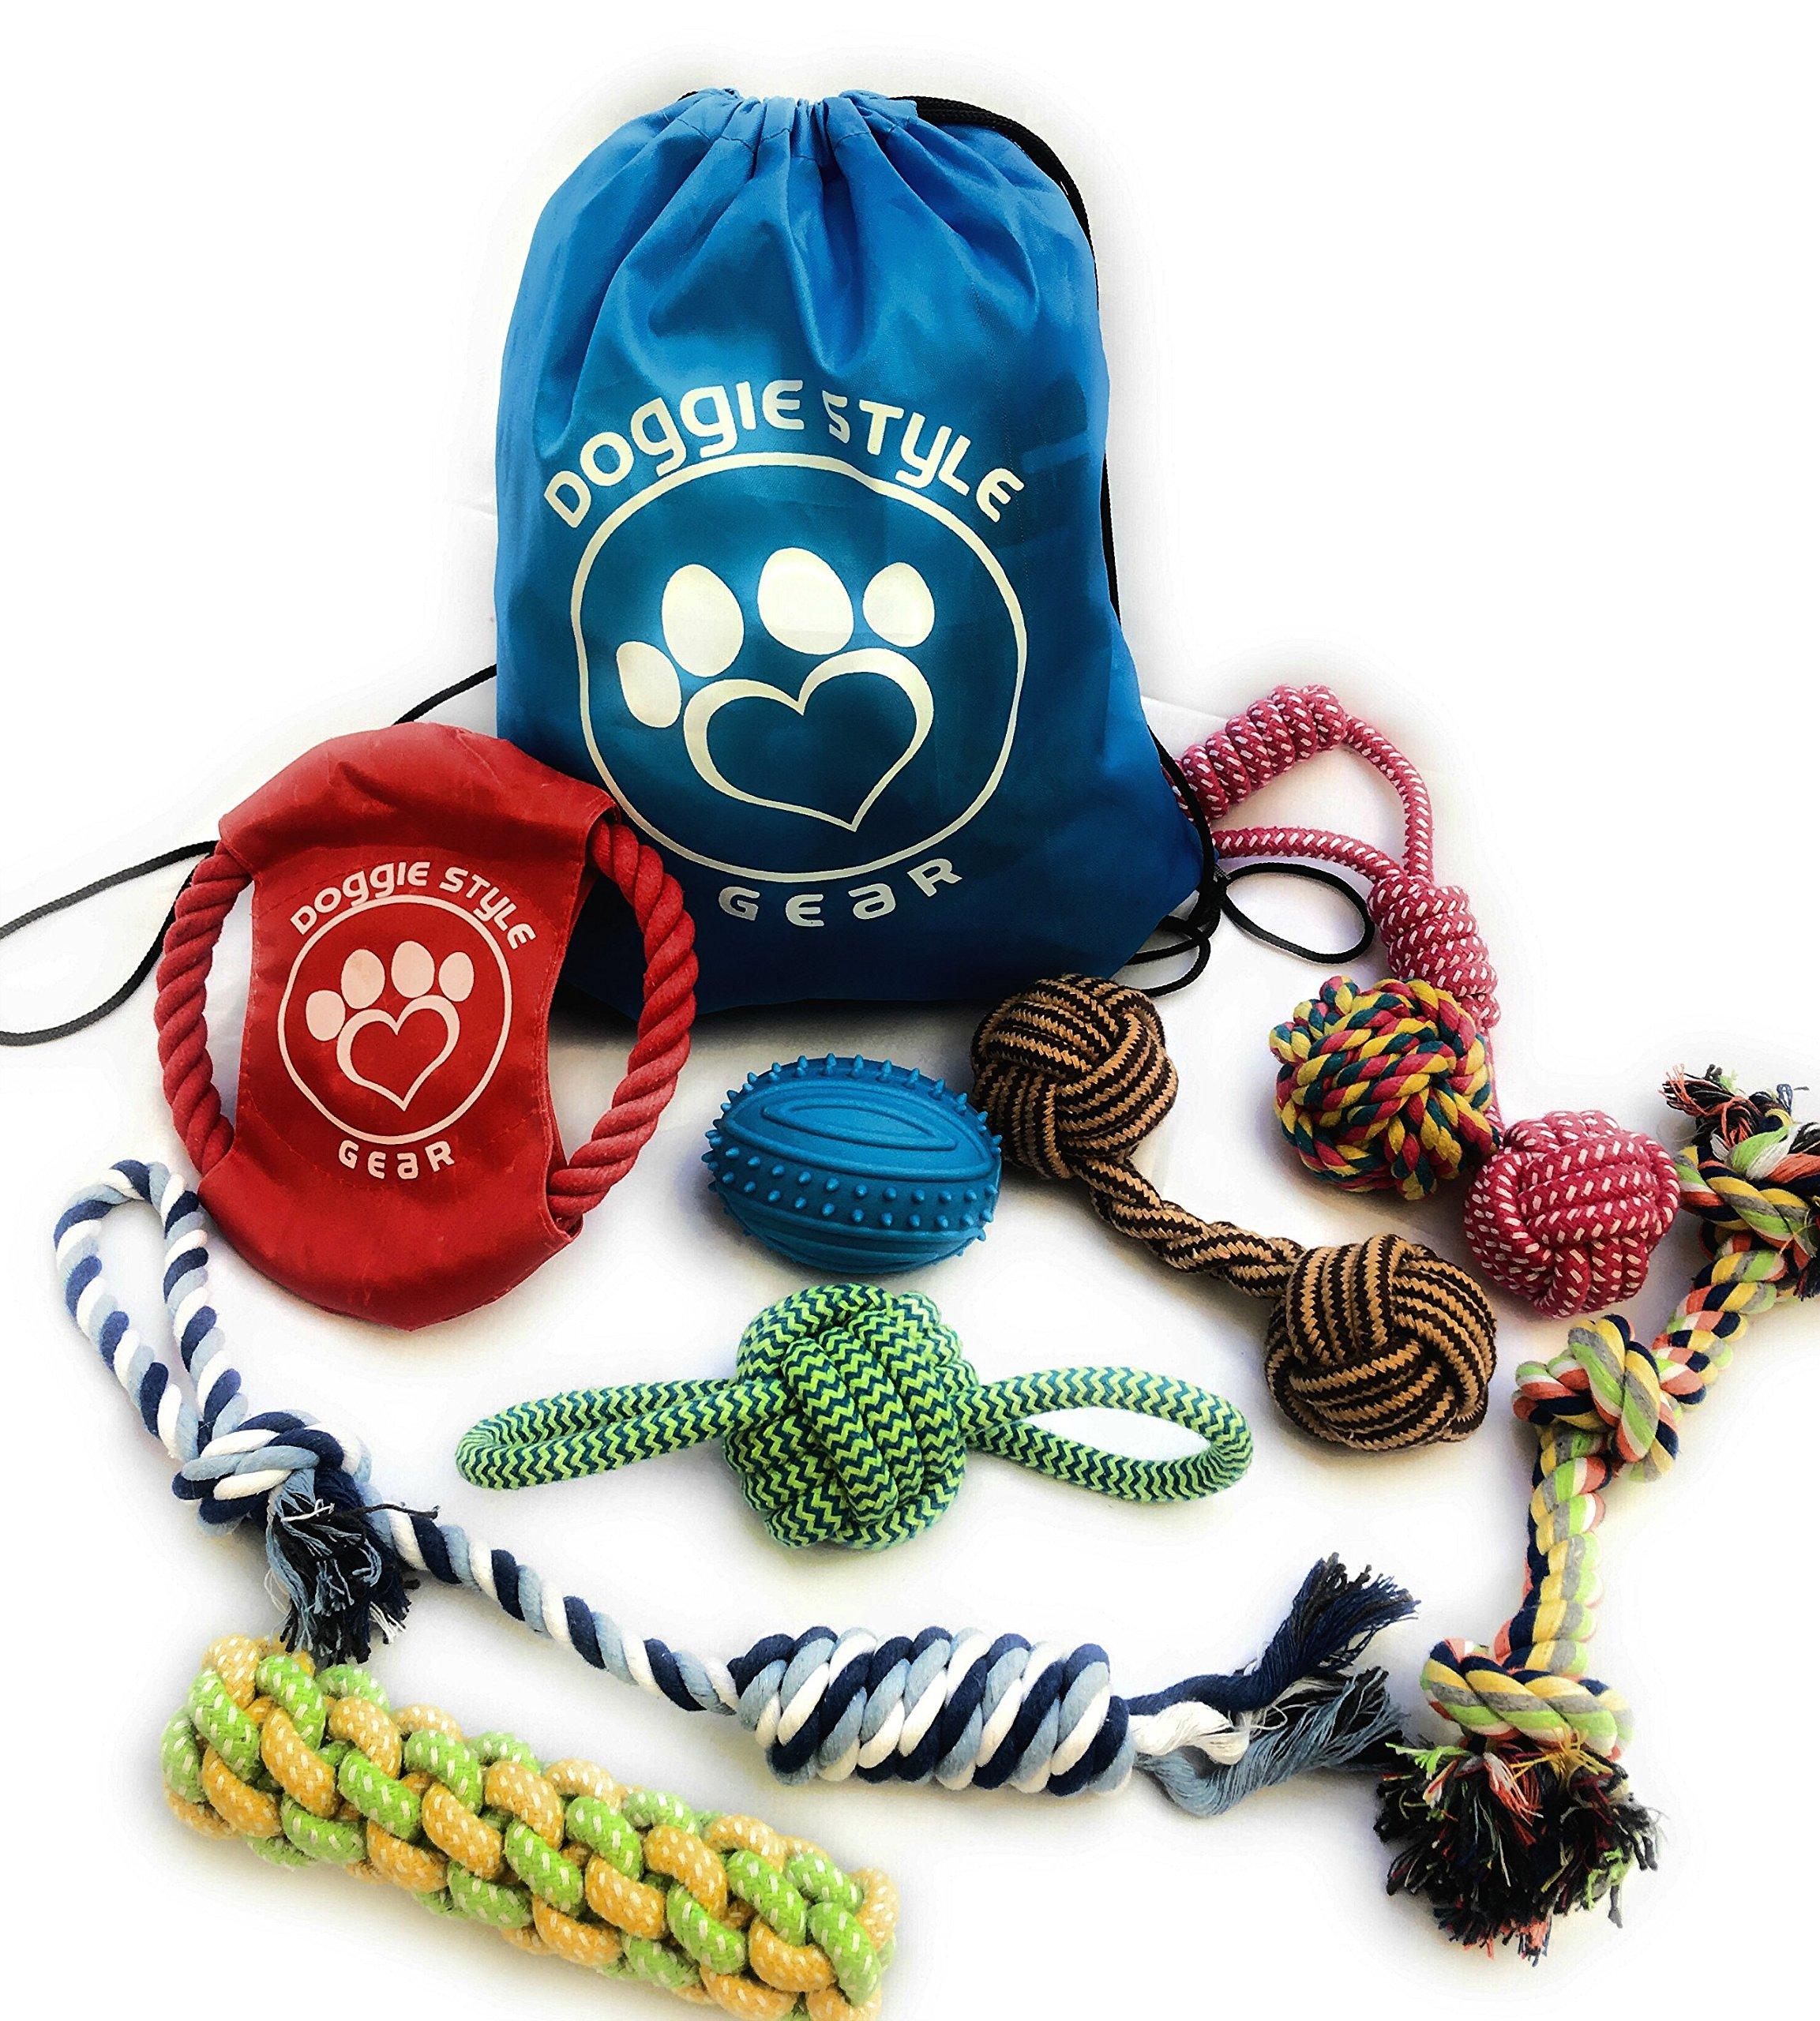 Dog Pet Rope Toys ◘ Tug-Of-War Playtime, 10 pcs Includes Storage Bag